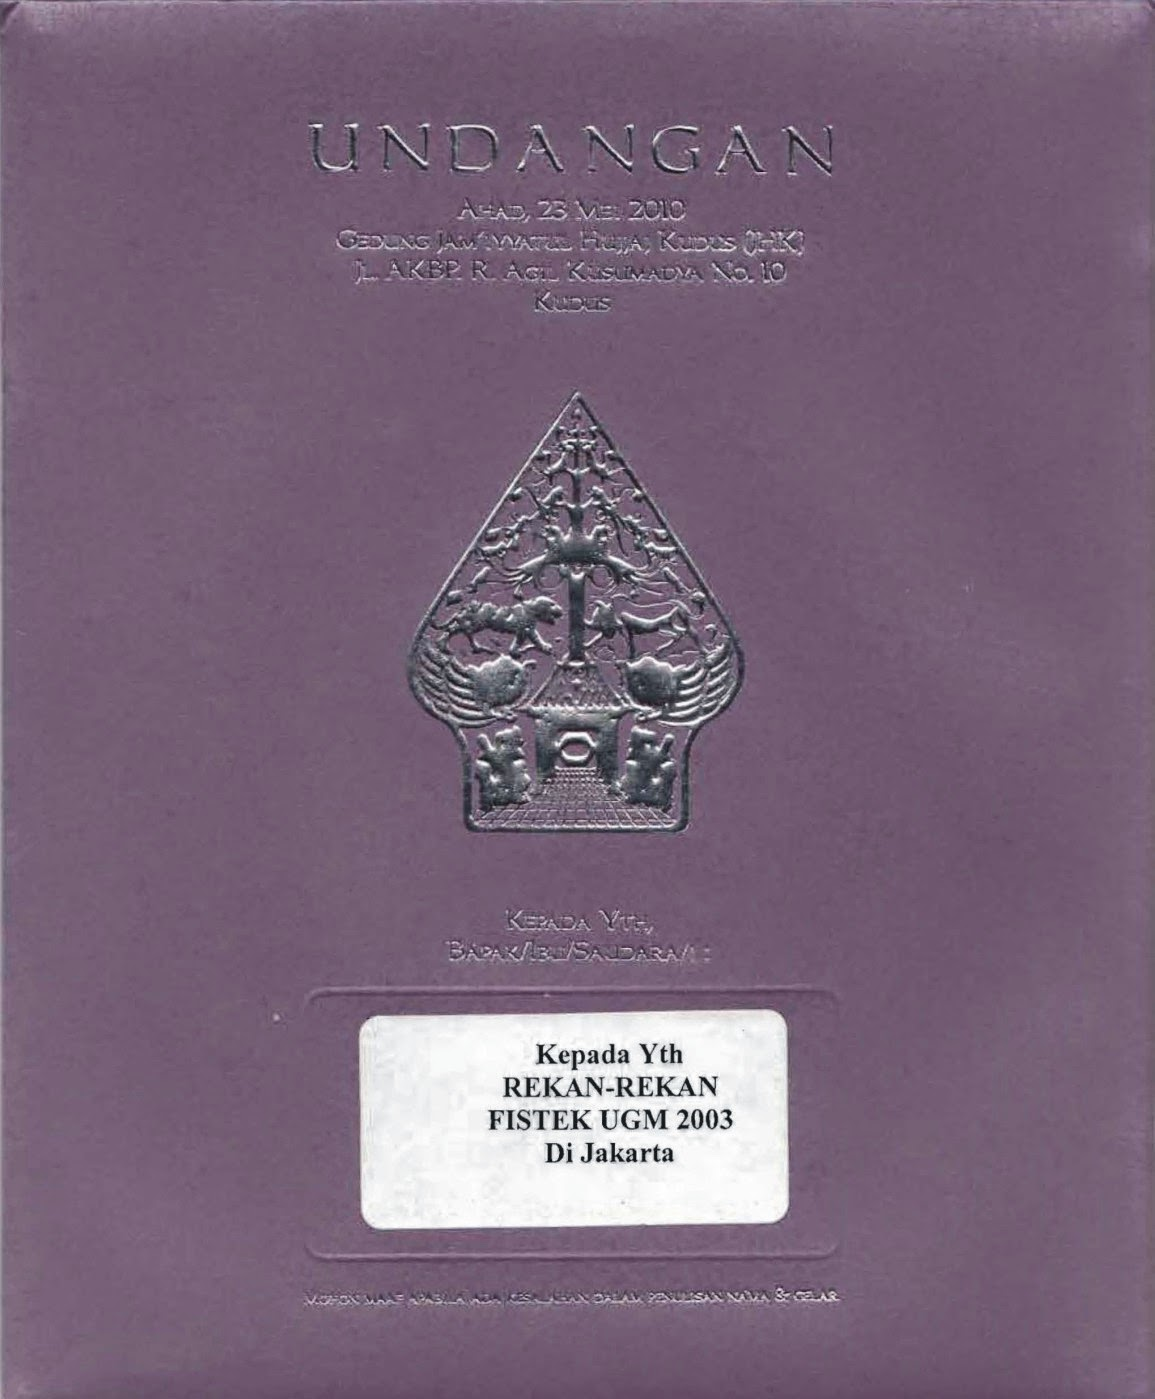 Contoh Desain Undangan Pernikahan Jawa - Contoh Isi Undangan